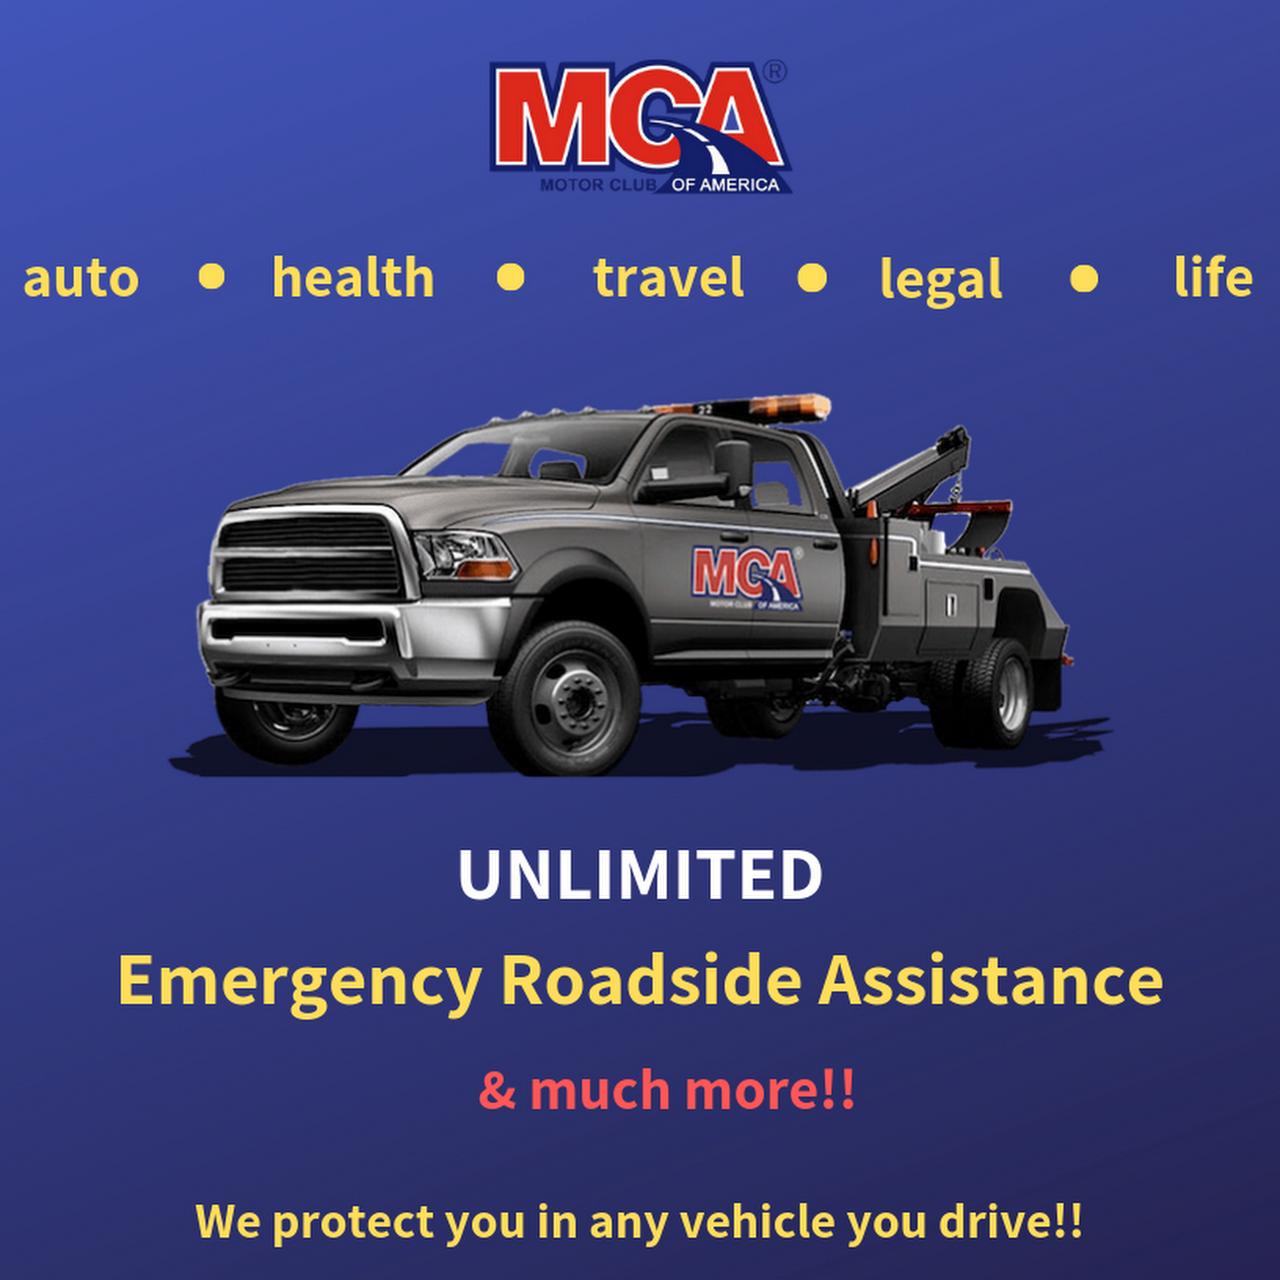 Motor Club of America (MCA), Michigan - Towing Service